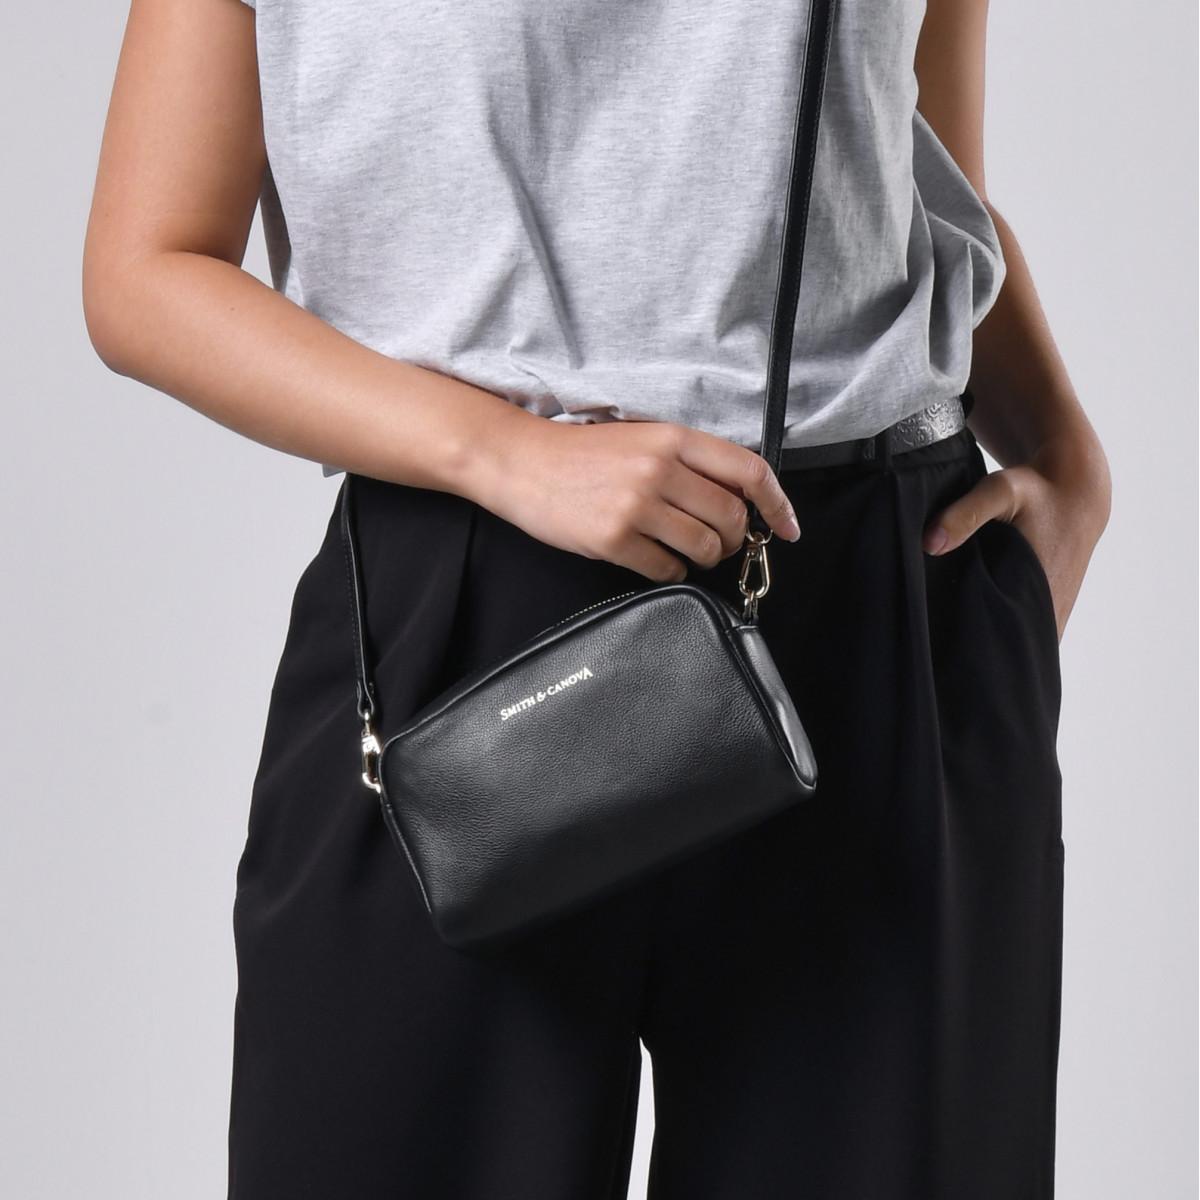 Small Zip Top Cross-body Bag · 92914 · 92914 · 92914 · 92914 091a3e0573f59